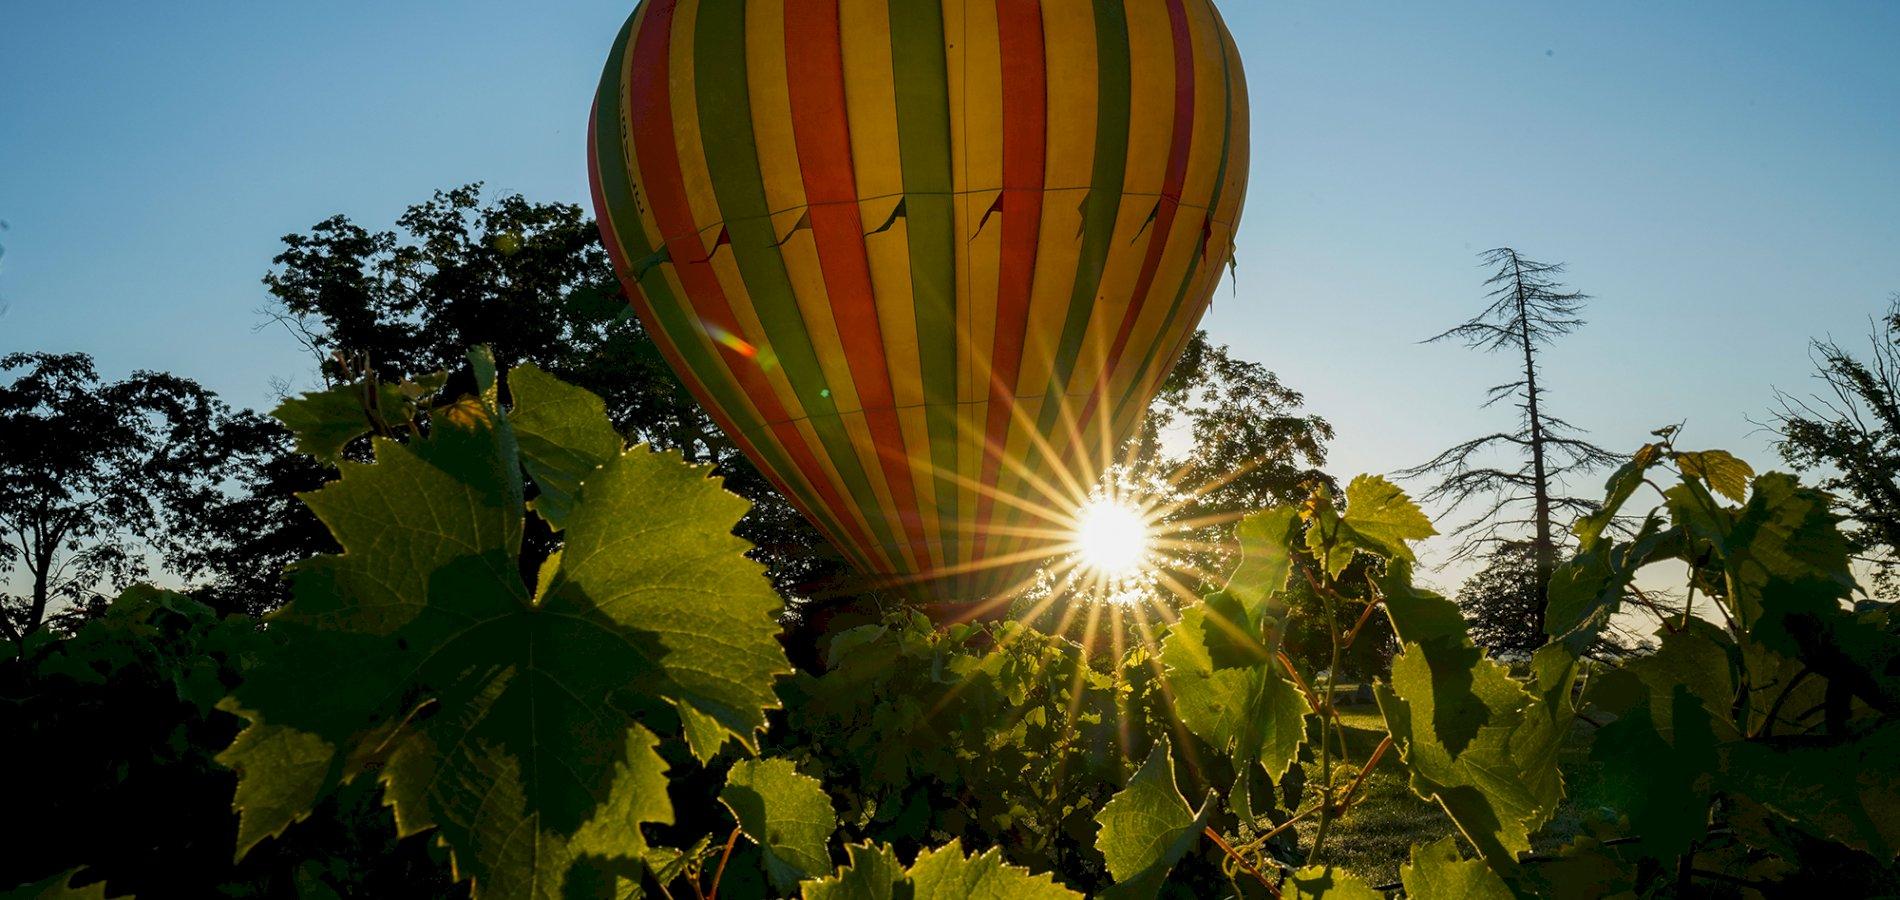 Ophorus Tours - Saint Emilion Wine Region Shared Hot Air Balloon Flight